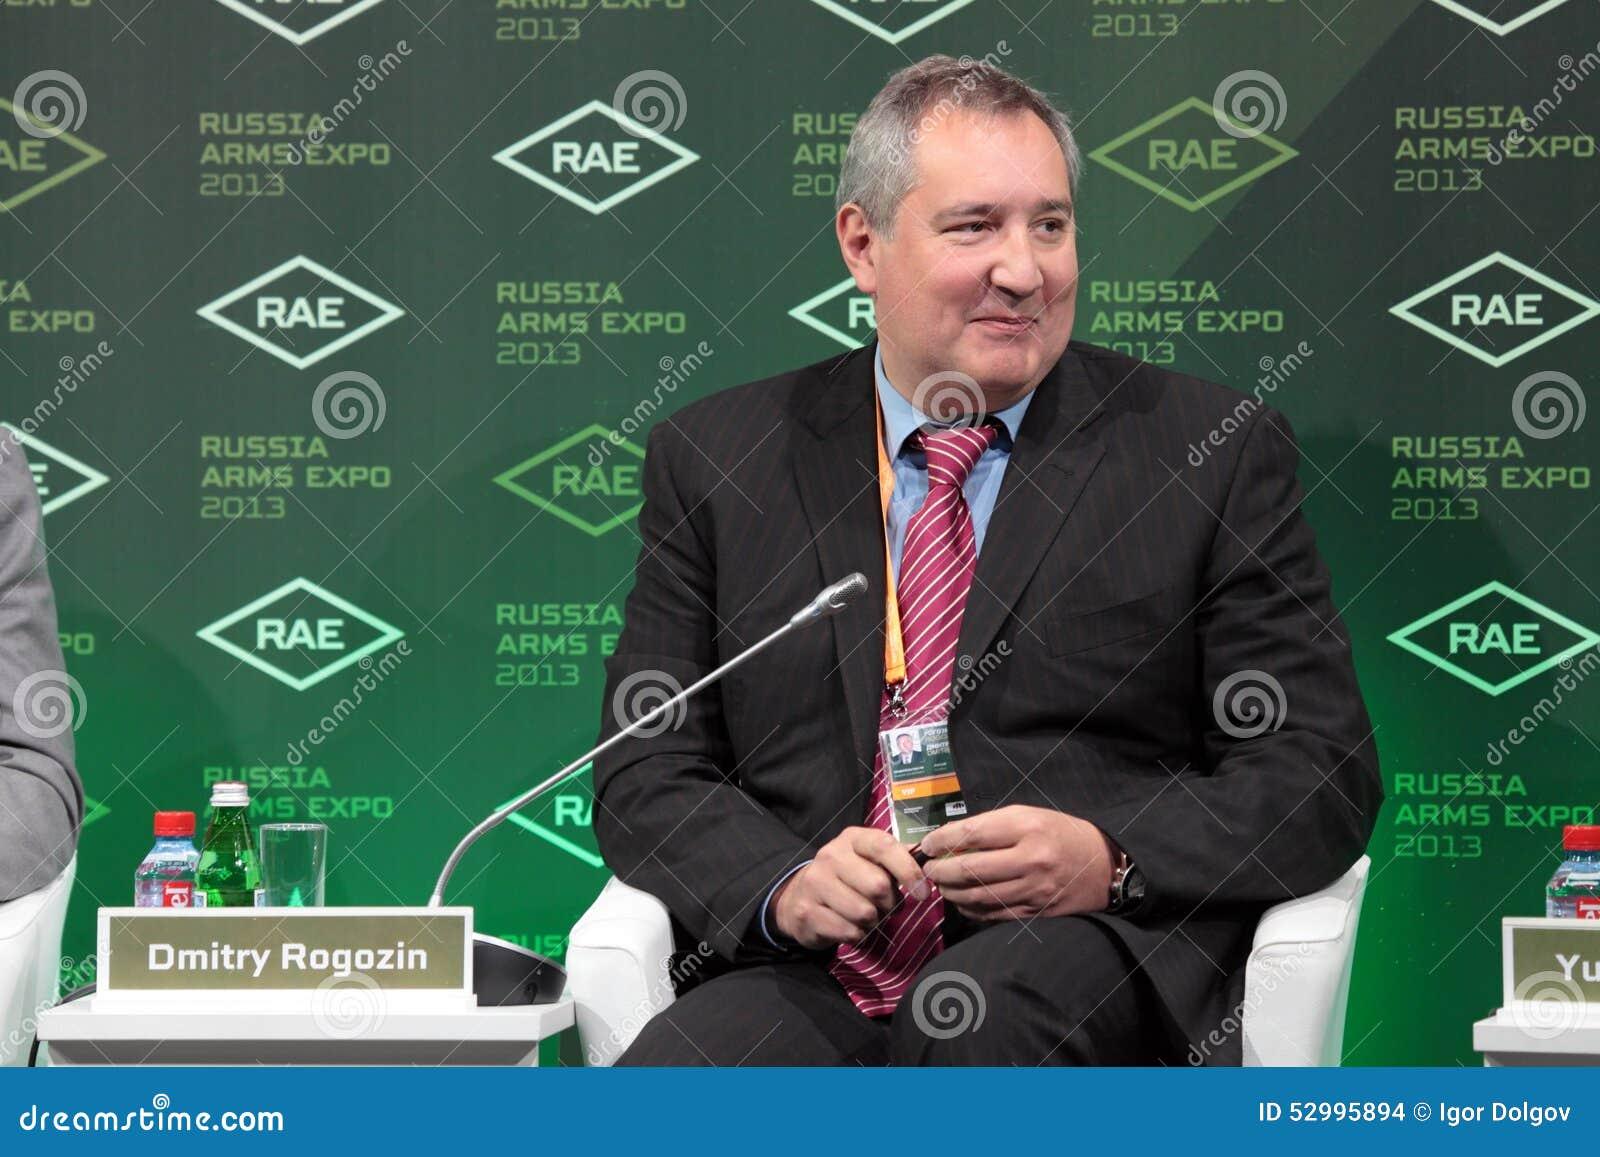 Dmitry Rogozin Editorial Stock Image - Image: 52995894